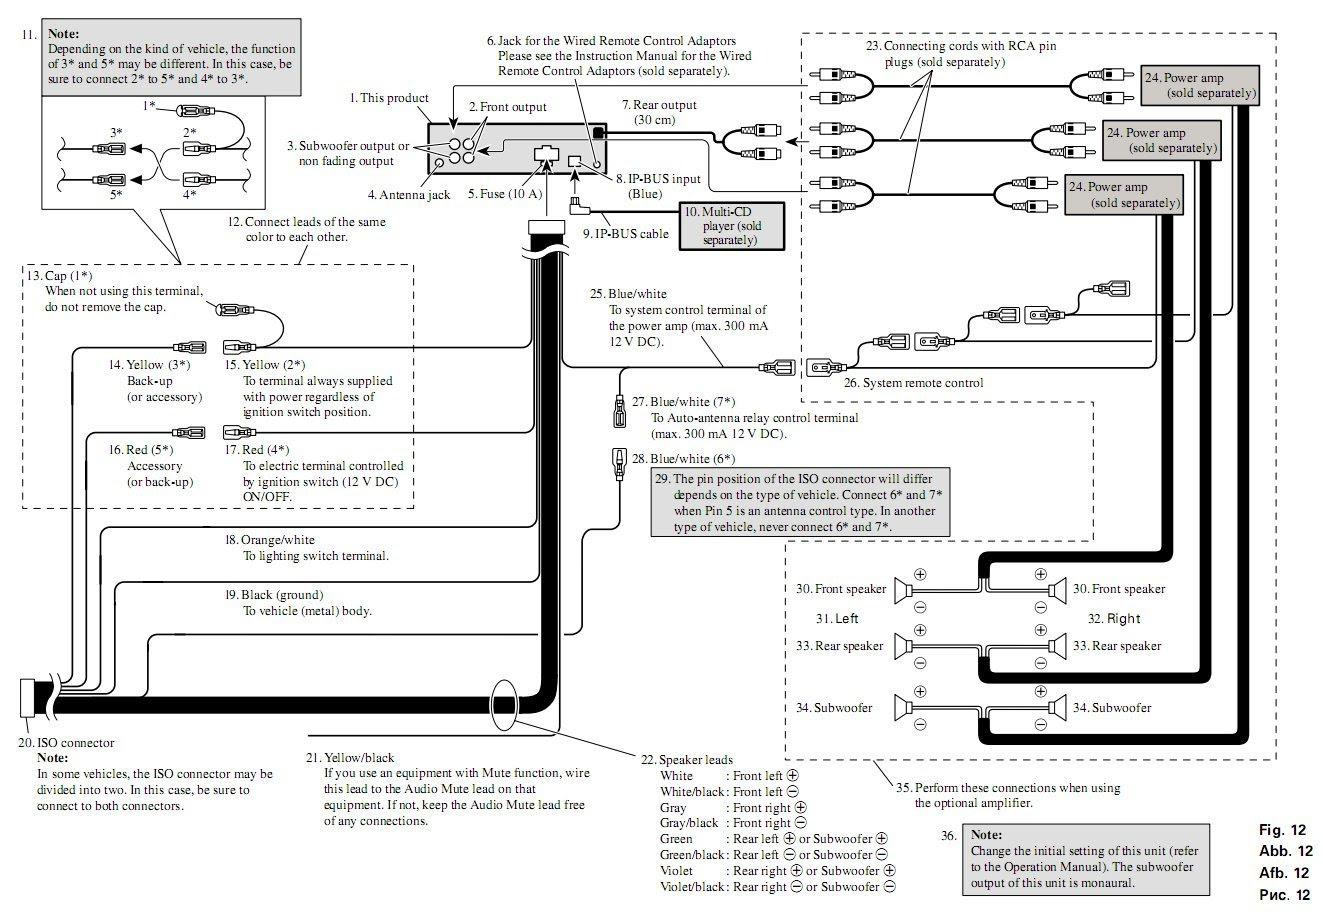 Diagram Car Stereo Pioneer Deh 1900mp Wiring Diagram Full Version Hd Quality Wiring Diagram Enwi929cix Gsdportotorres It